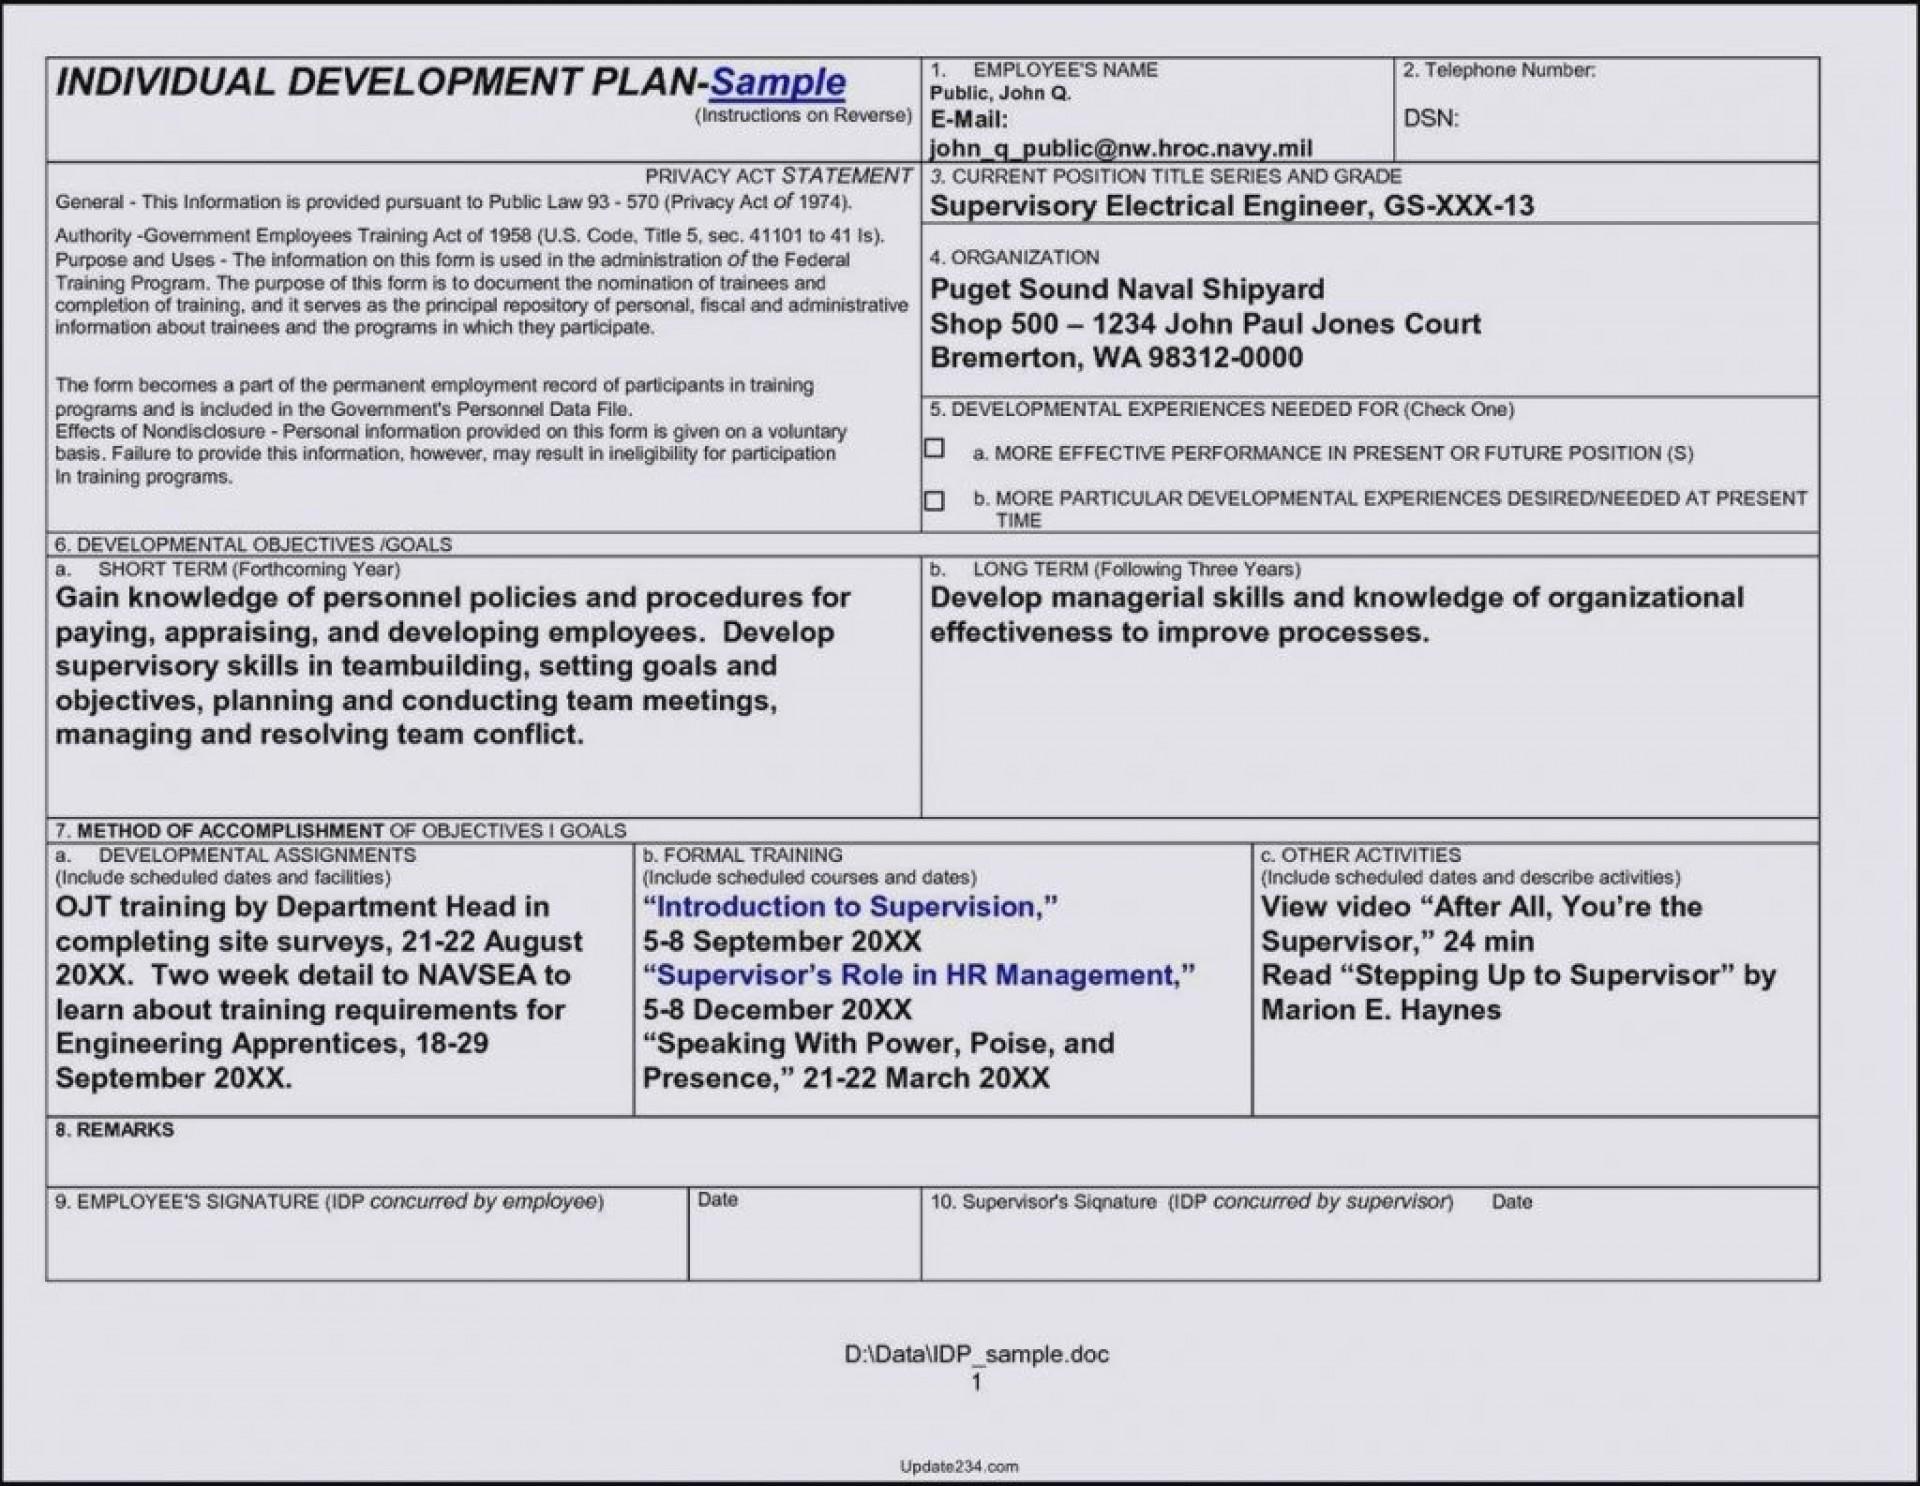 002 Sensational Employee Development Action Plan Example Idea  Examples1920